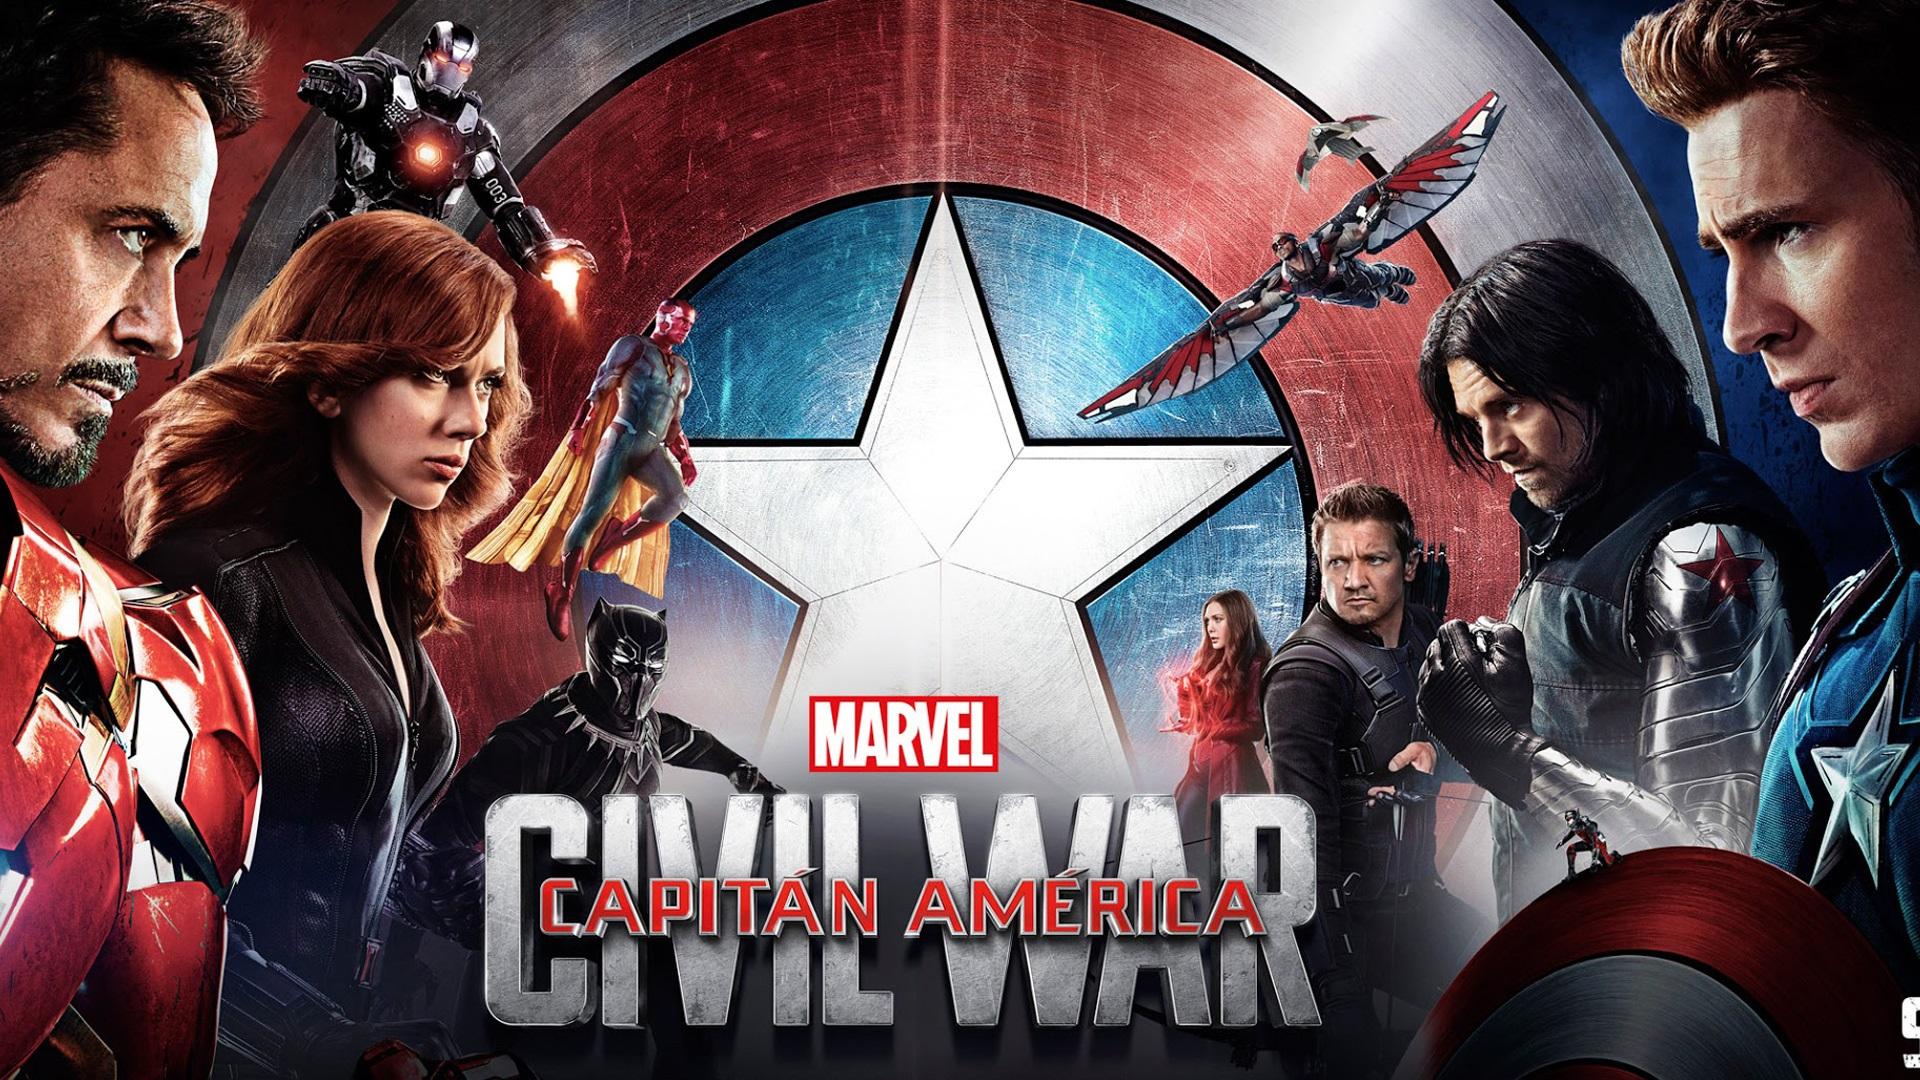 Wallpaper 2016 Movie Captain America Civil War Hd 1920x1080 Full